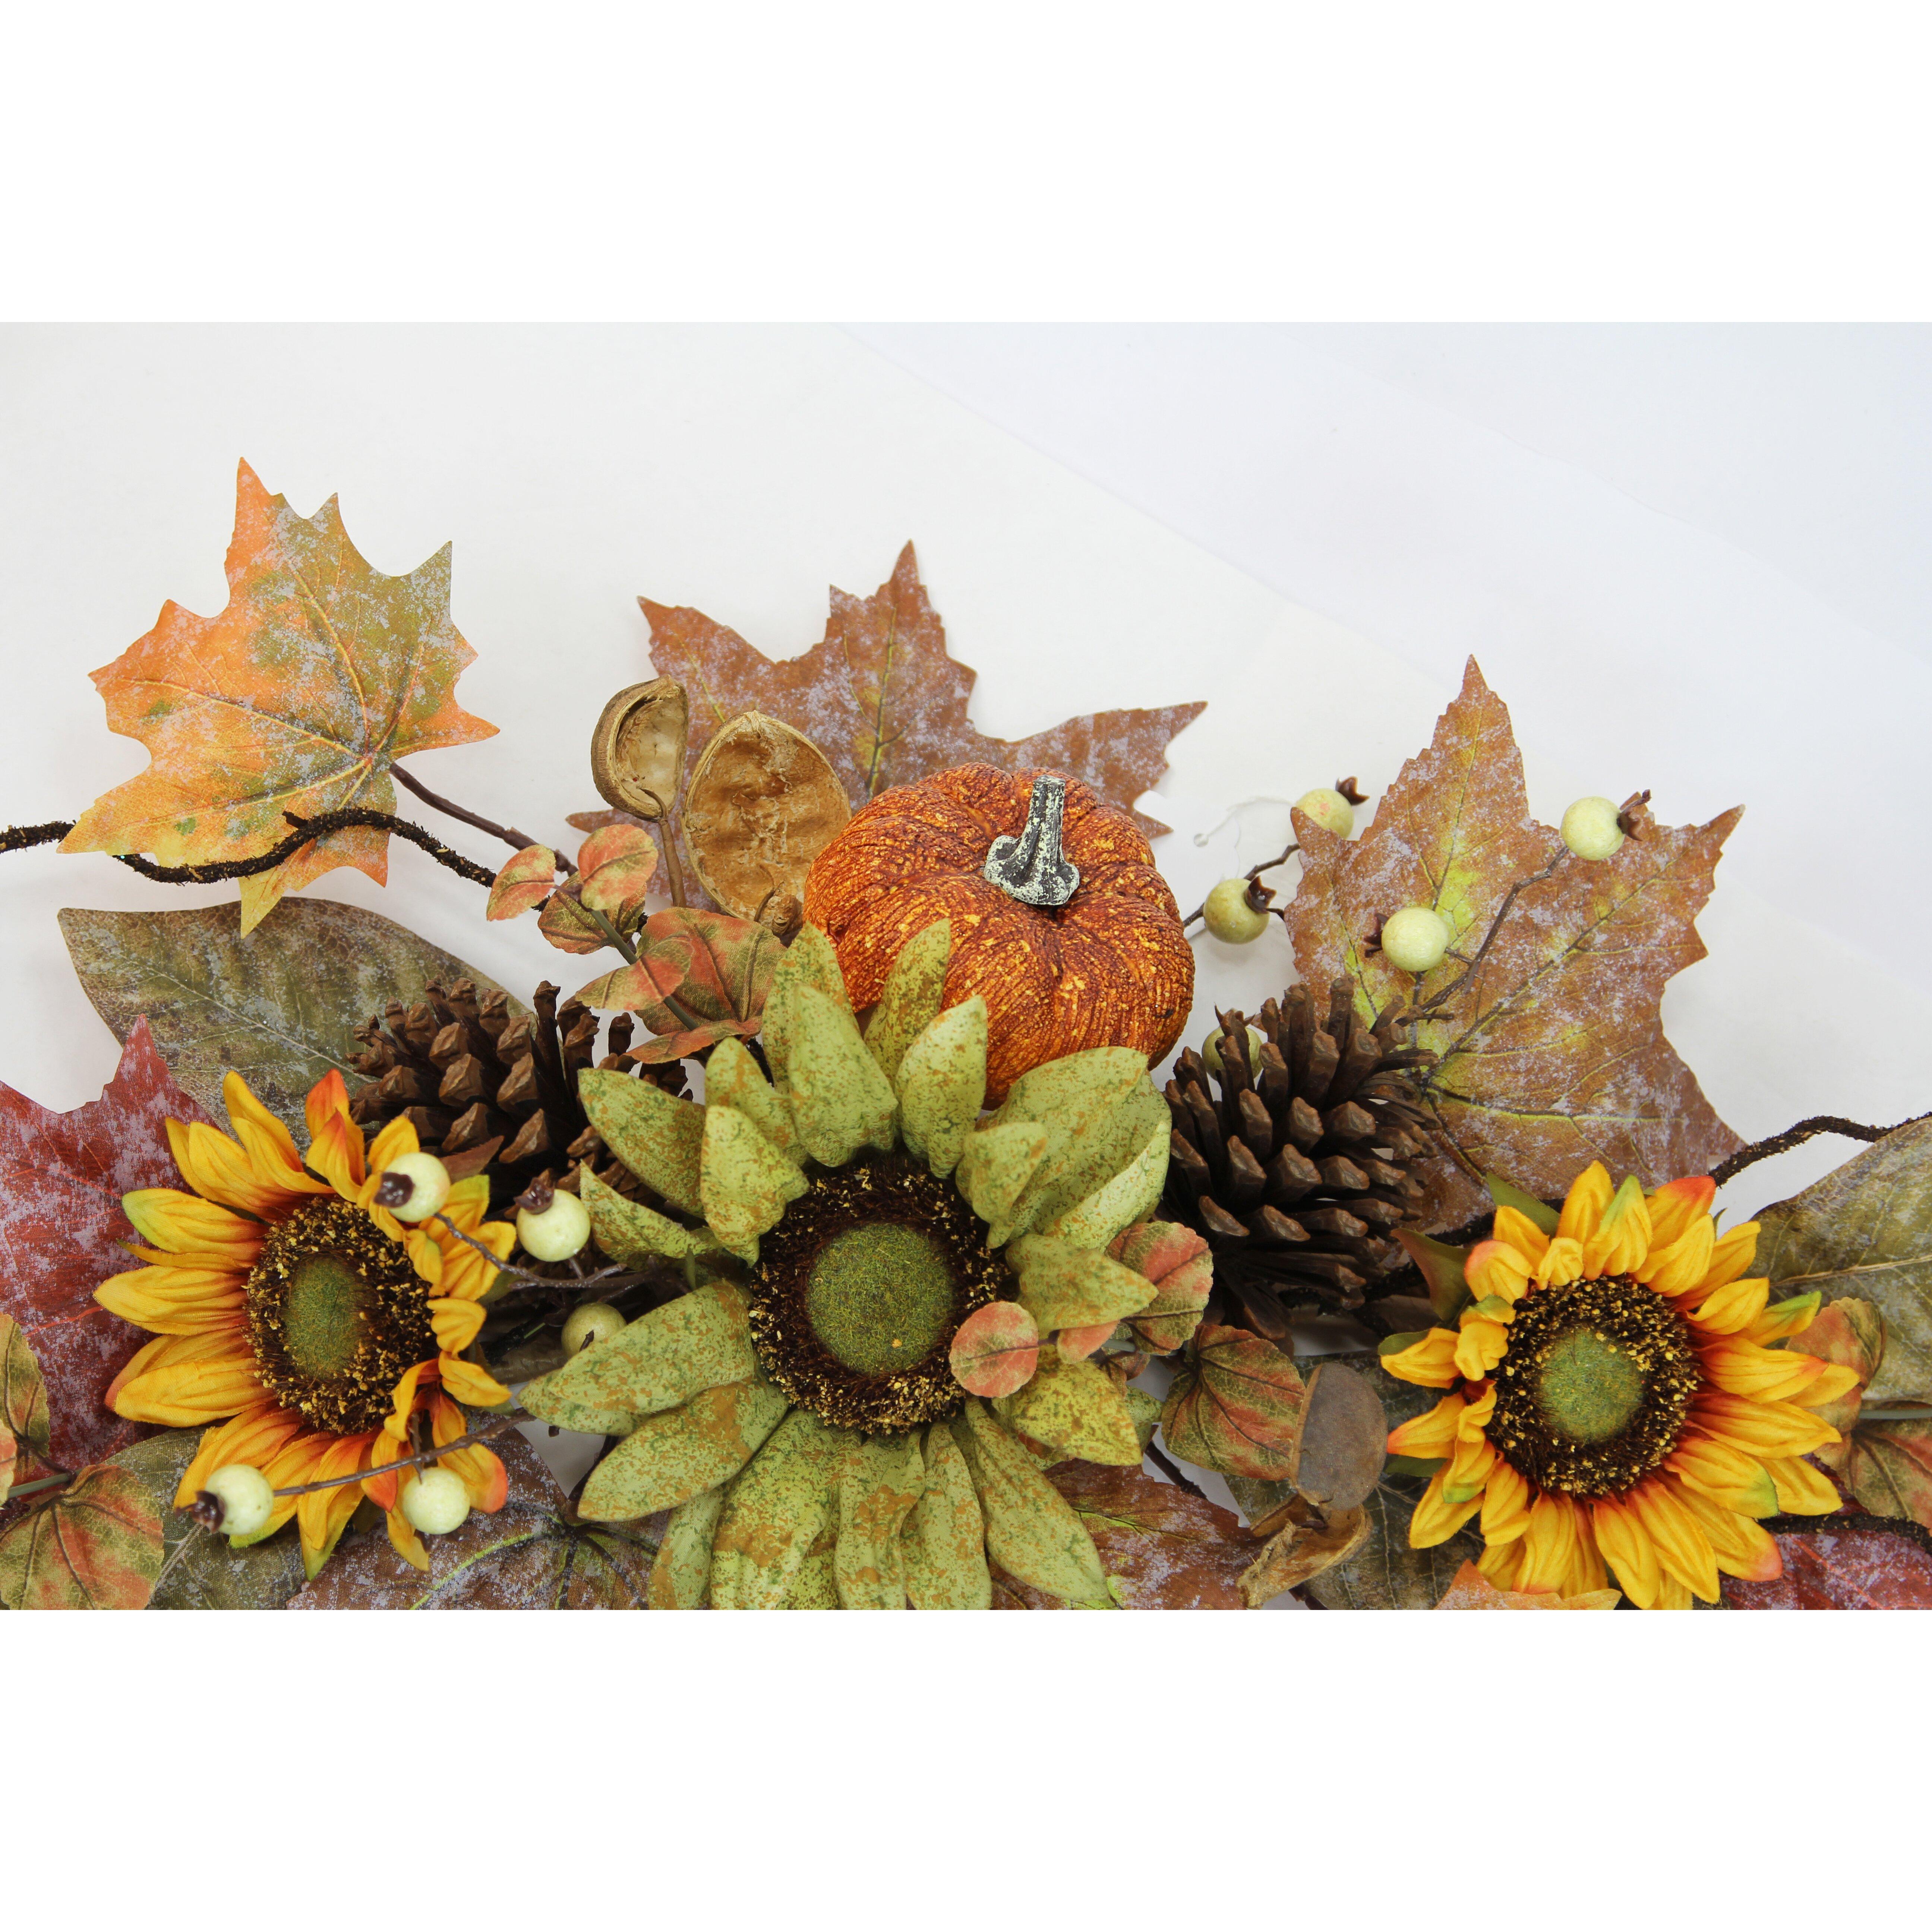 Springtime Wreaths Admiredbynature Artificial Sunflowers Pumpkins Pinecone